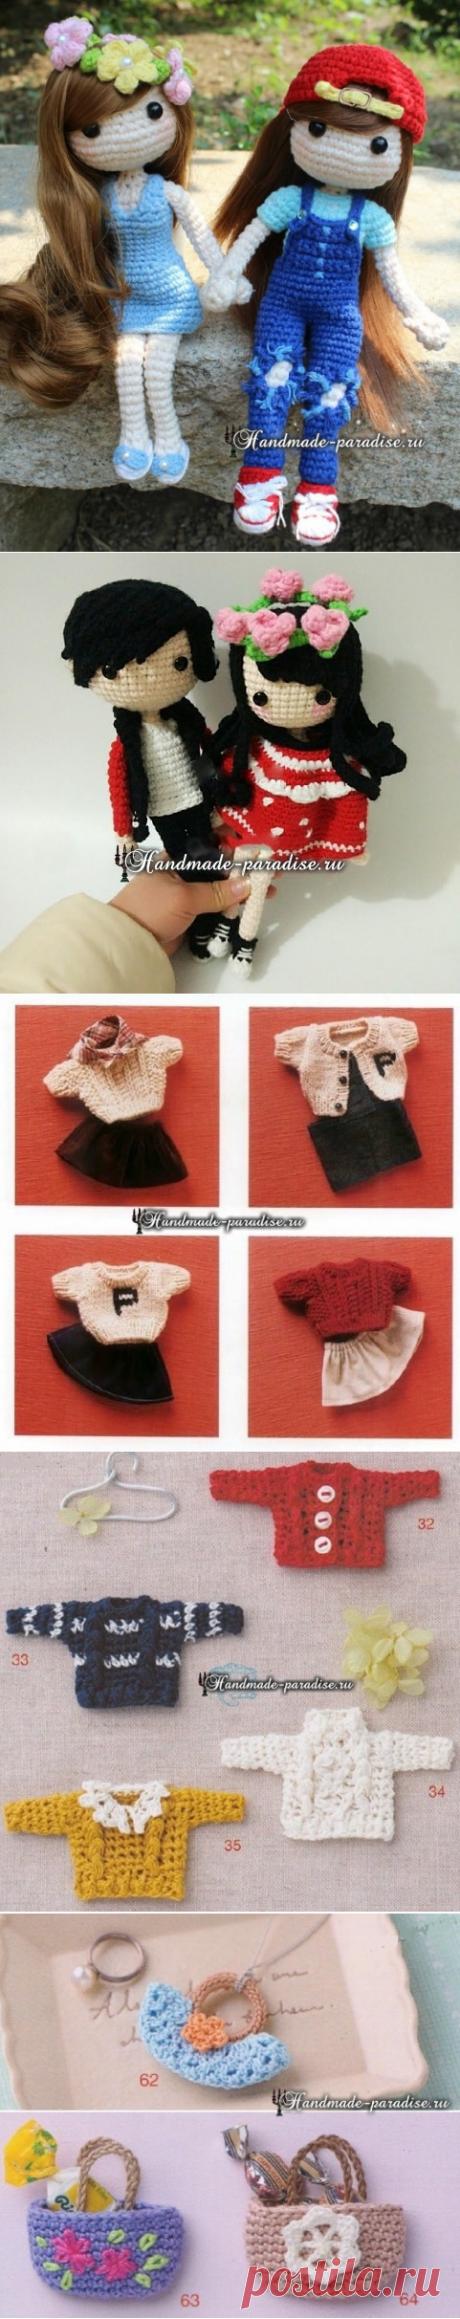 Вязаная мода для кукол амигуруми. Схемы - Handmade-Paradise